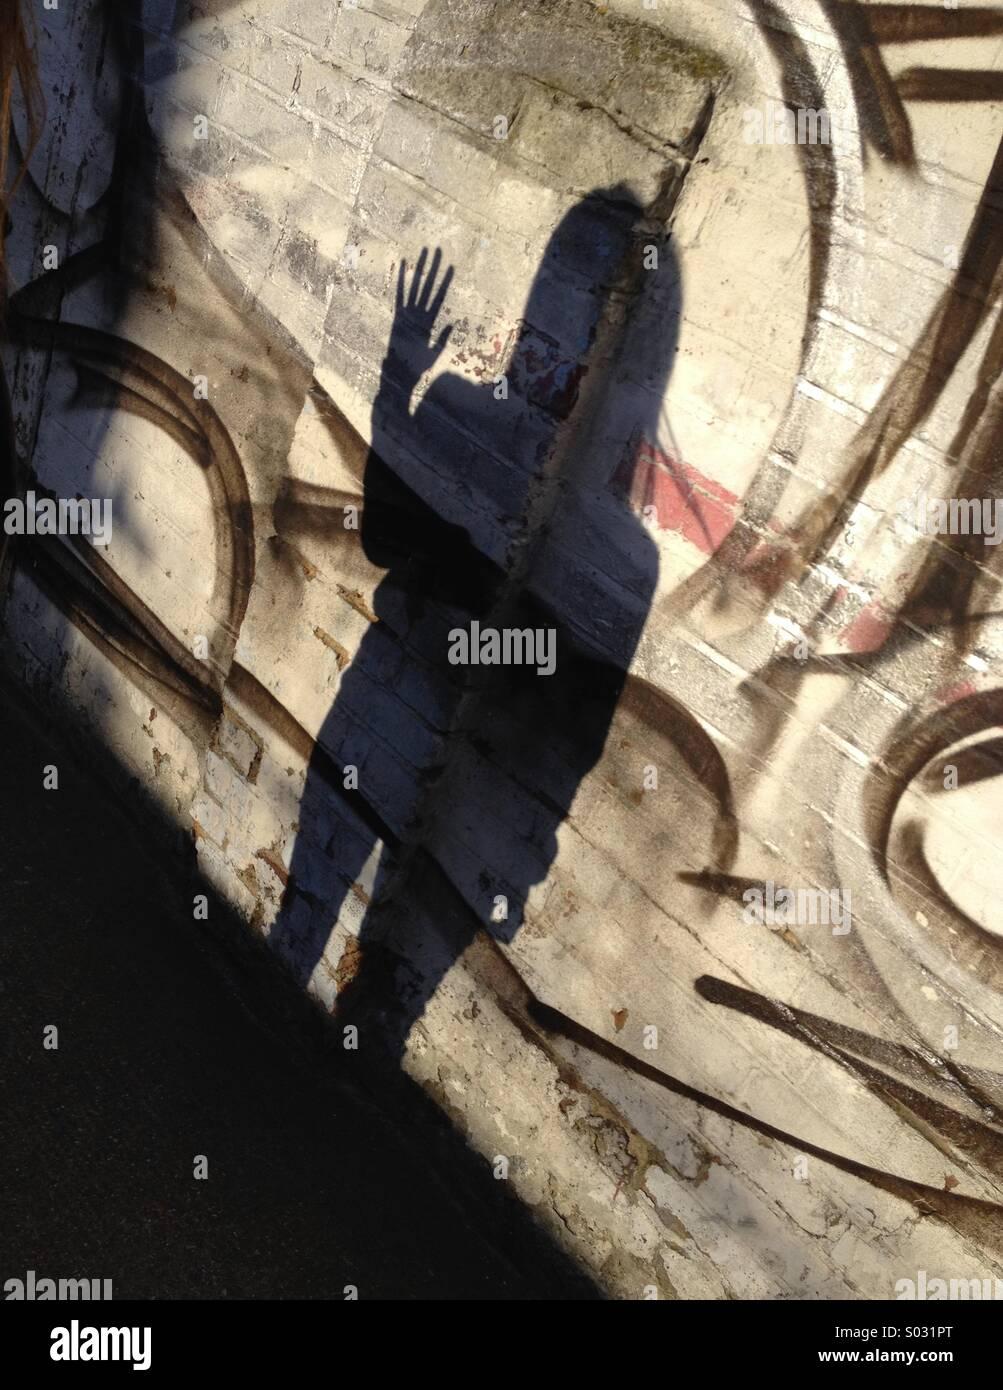 Shadow waving on wall - Stock Image